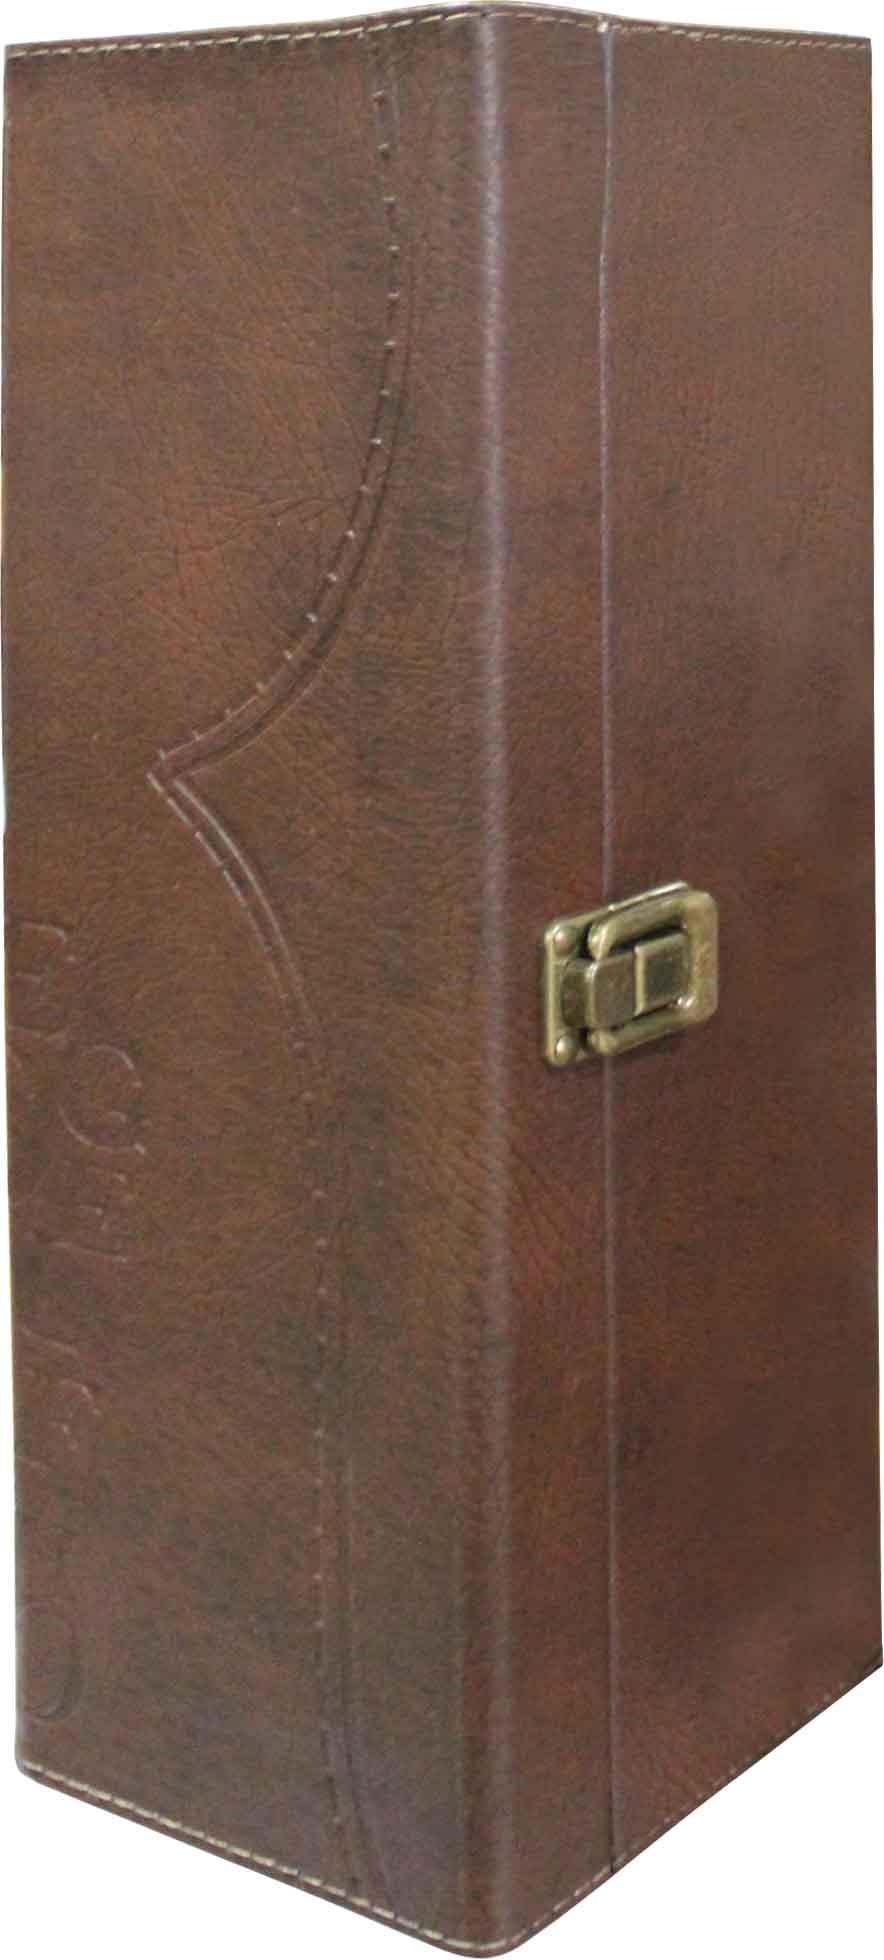 Luxury single leather box with handle